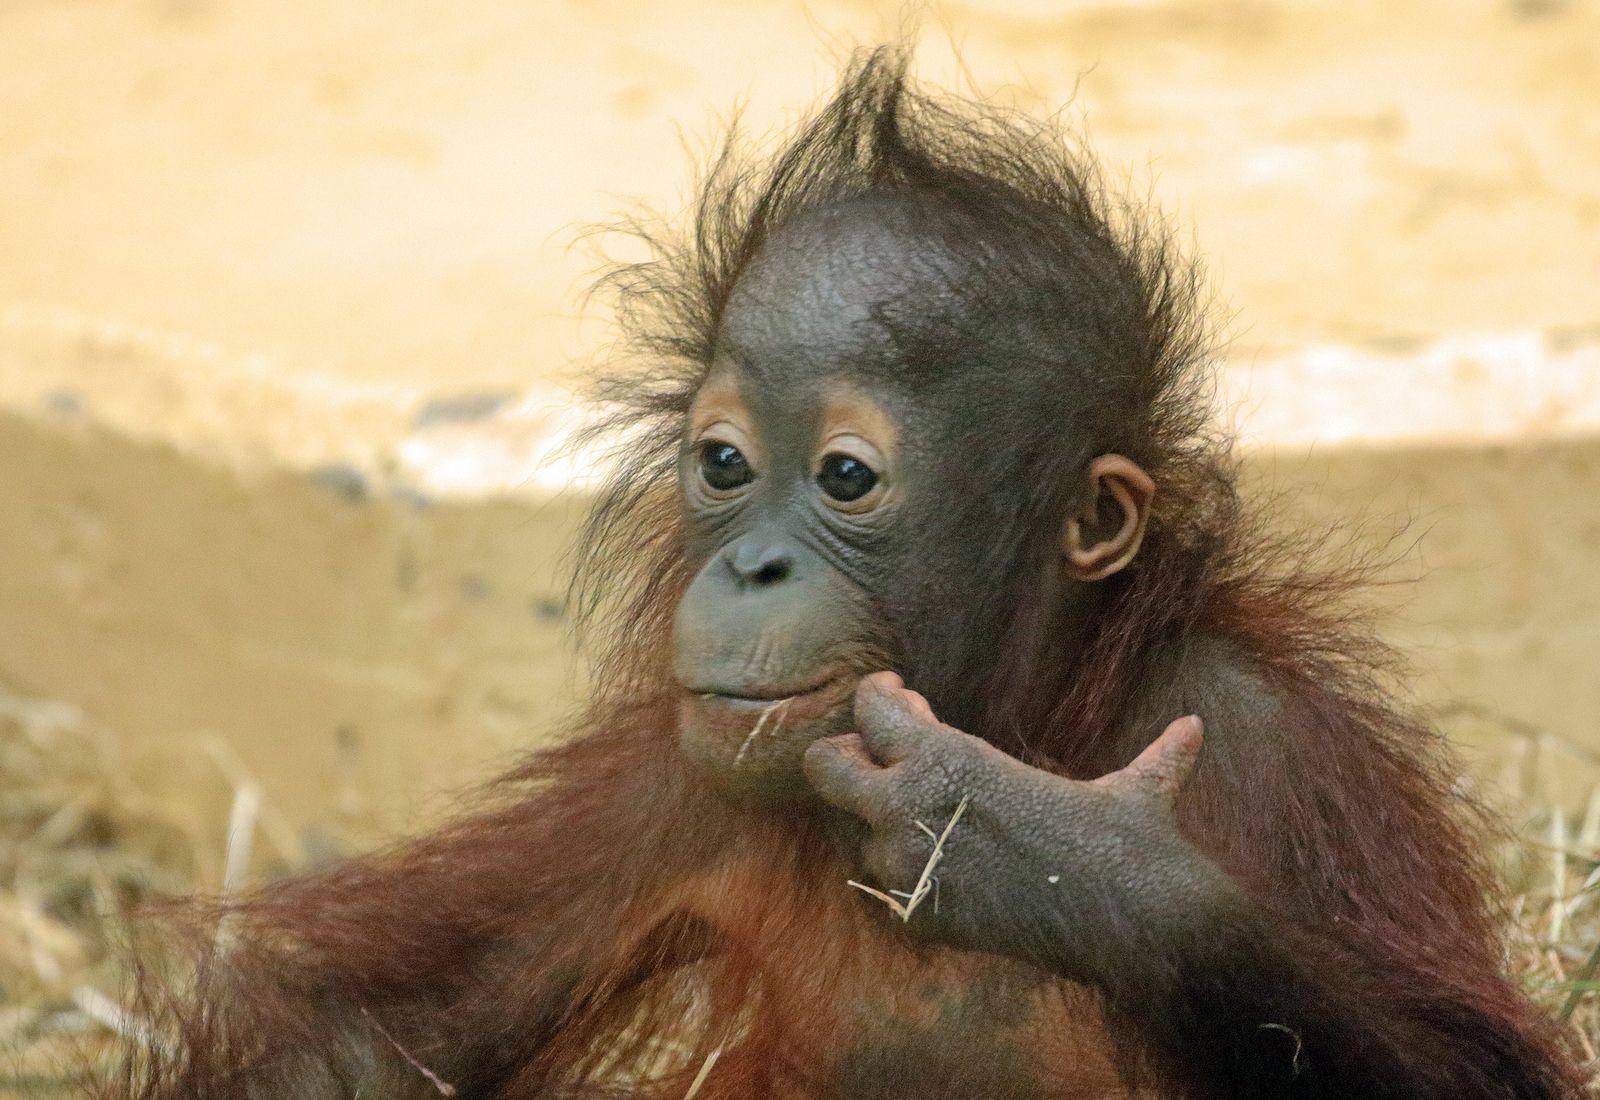 Sumatran Orangutan Sabbar Ouwehands Bb2a2810 Baby Orangutan Orangutan Sumatran Orangutan